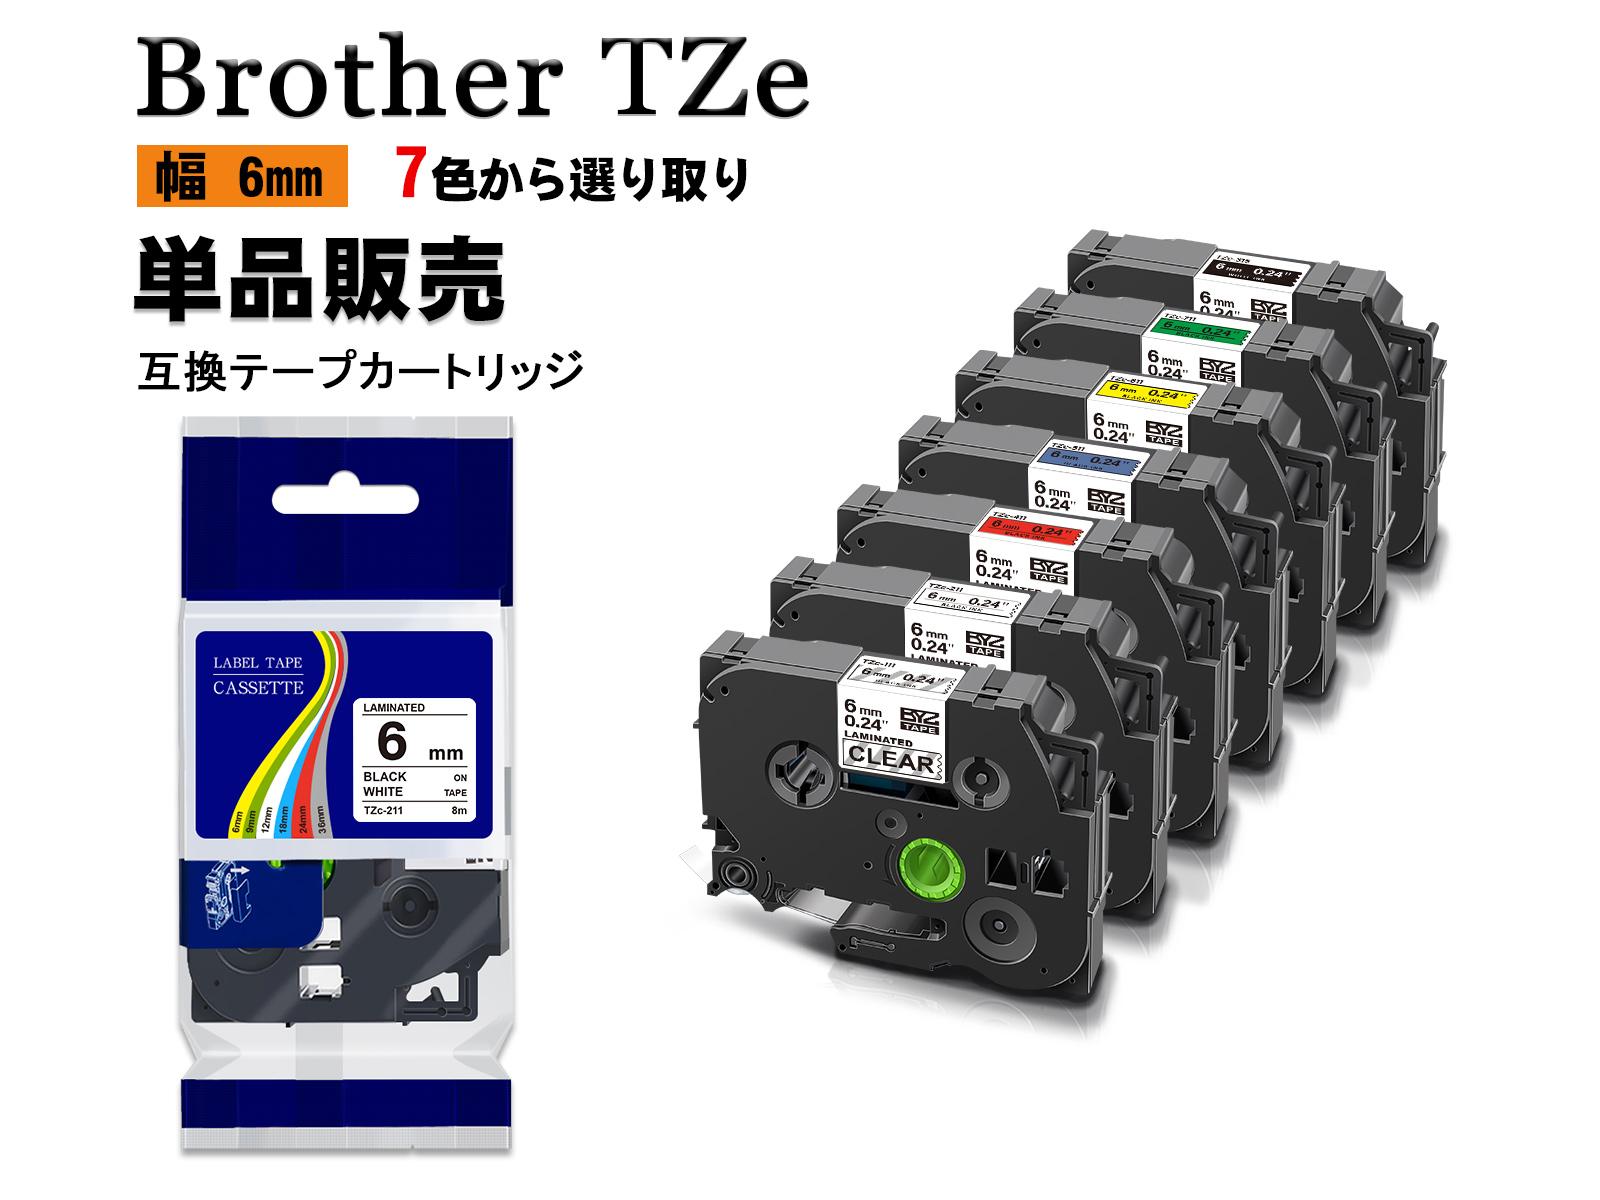 TZeテープ TZeシリーズ お名前シール 幅 6mm 全 7色 名前シール 2020 新作 セール価格 Brother テプラテープ マイラベル 長さ 1個 8m 2年保証可能 ブラザー ピータッチキューブ用 互換